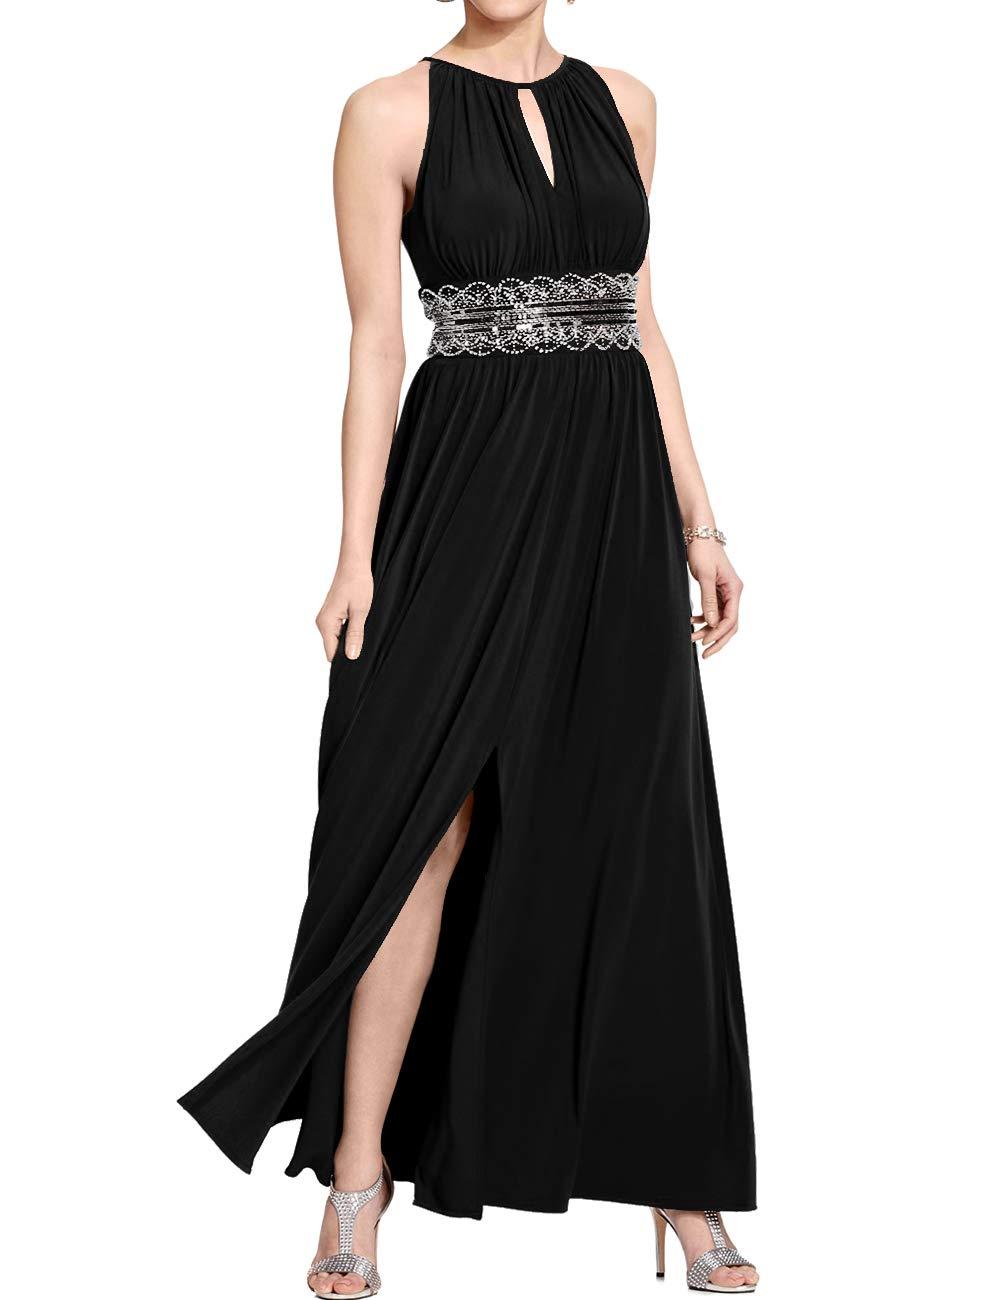 6e0cd4453c3b8 Halter Evening Dresses Long Prom Dresses Chiffon Bridesmaid Dresses Black  28W